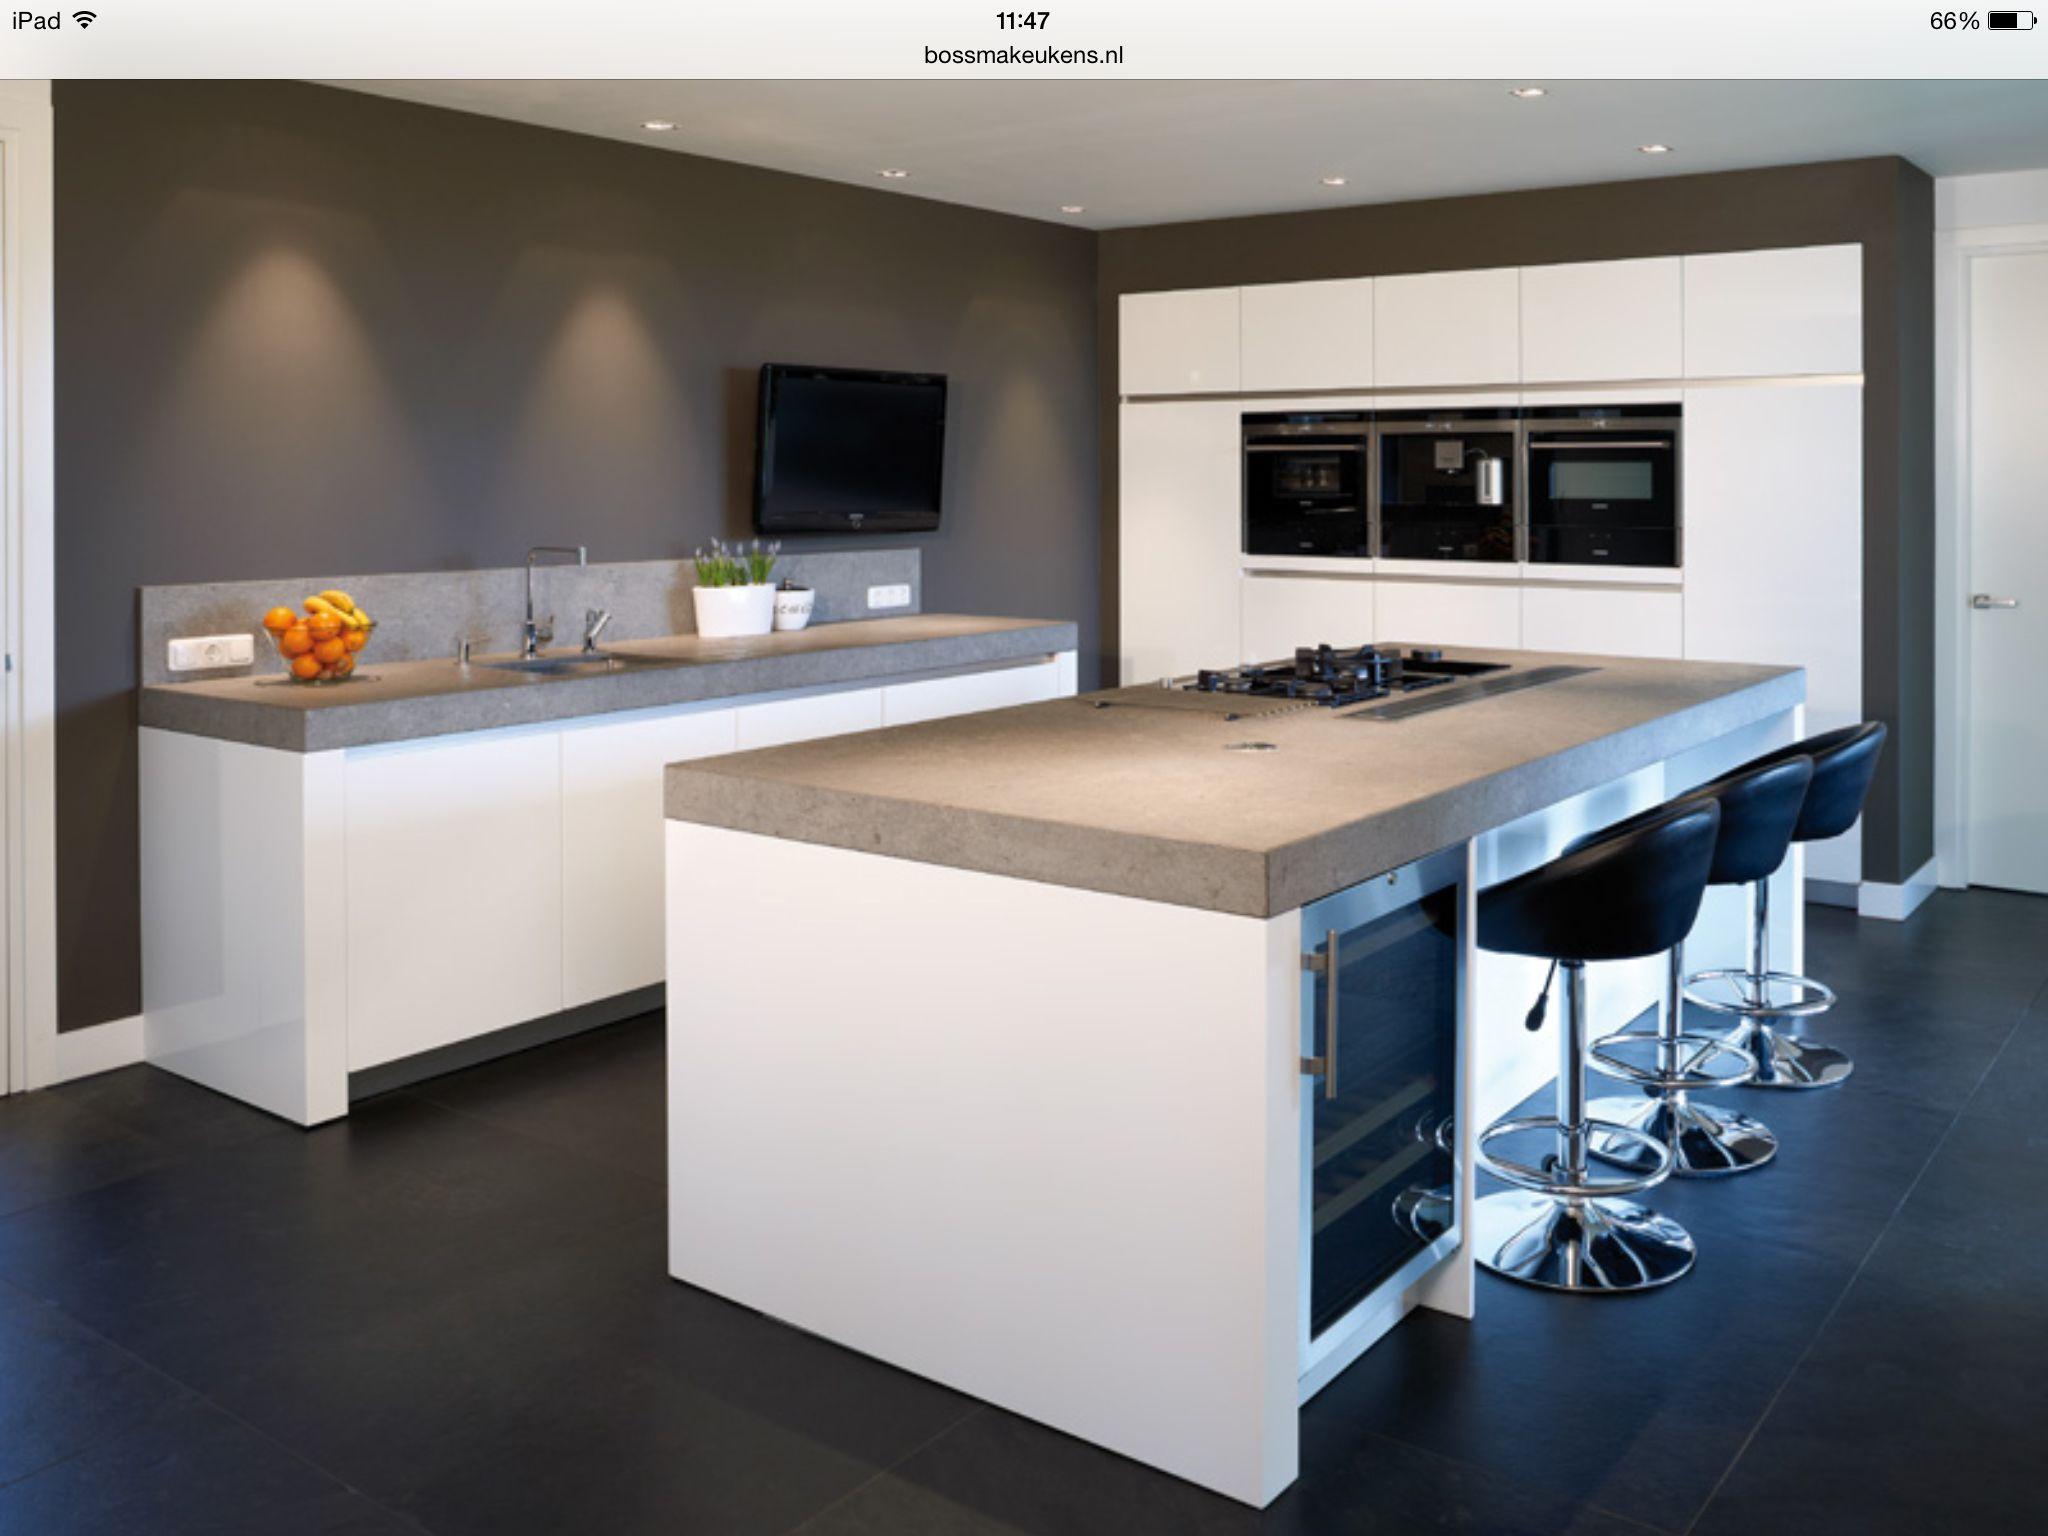 Keuken opstelling | VD86 | Pinterest | Küche, Küchenspülen und ...